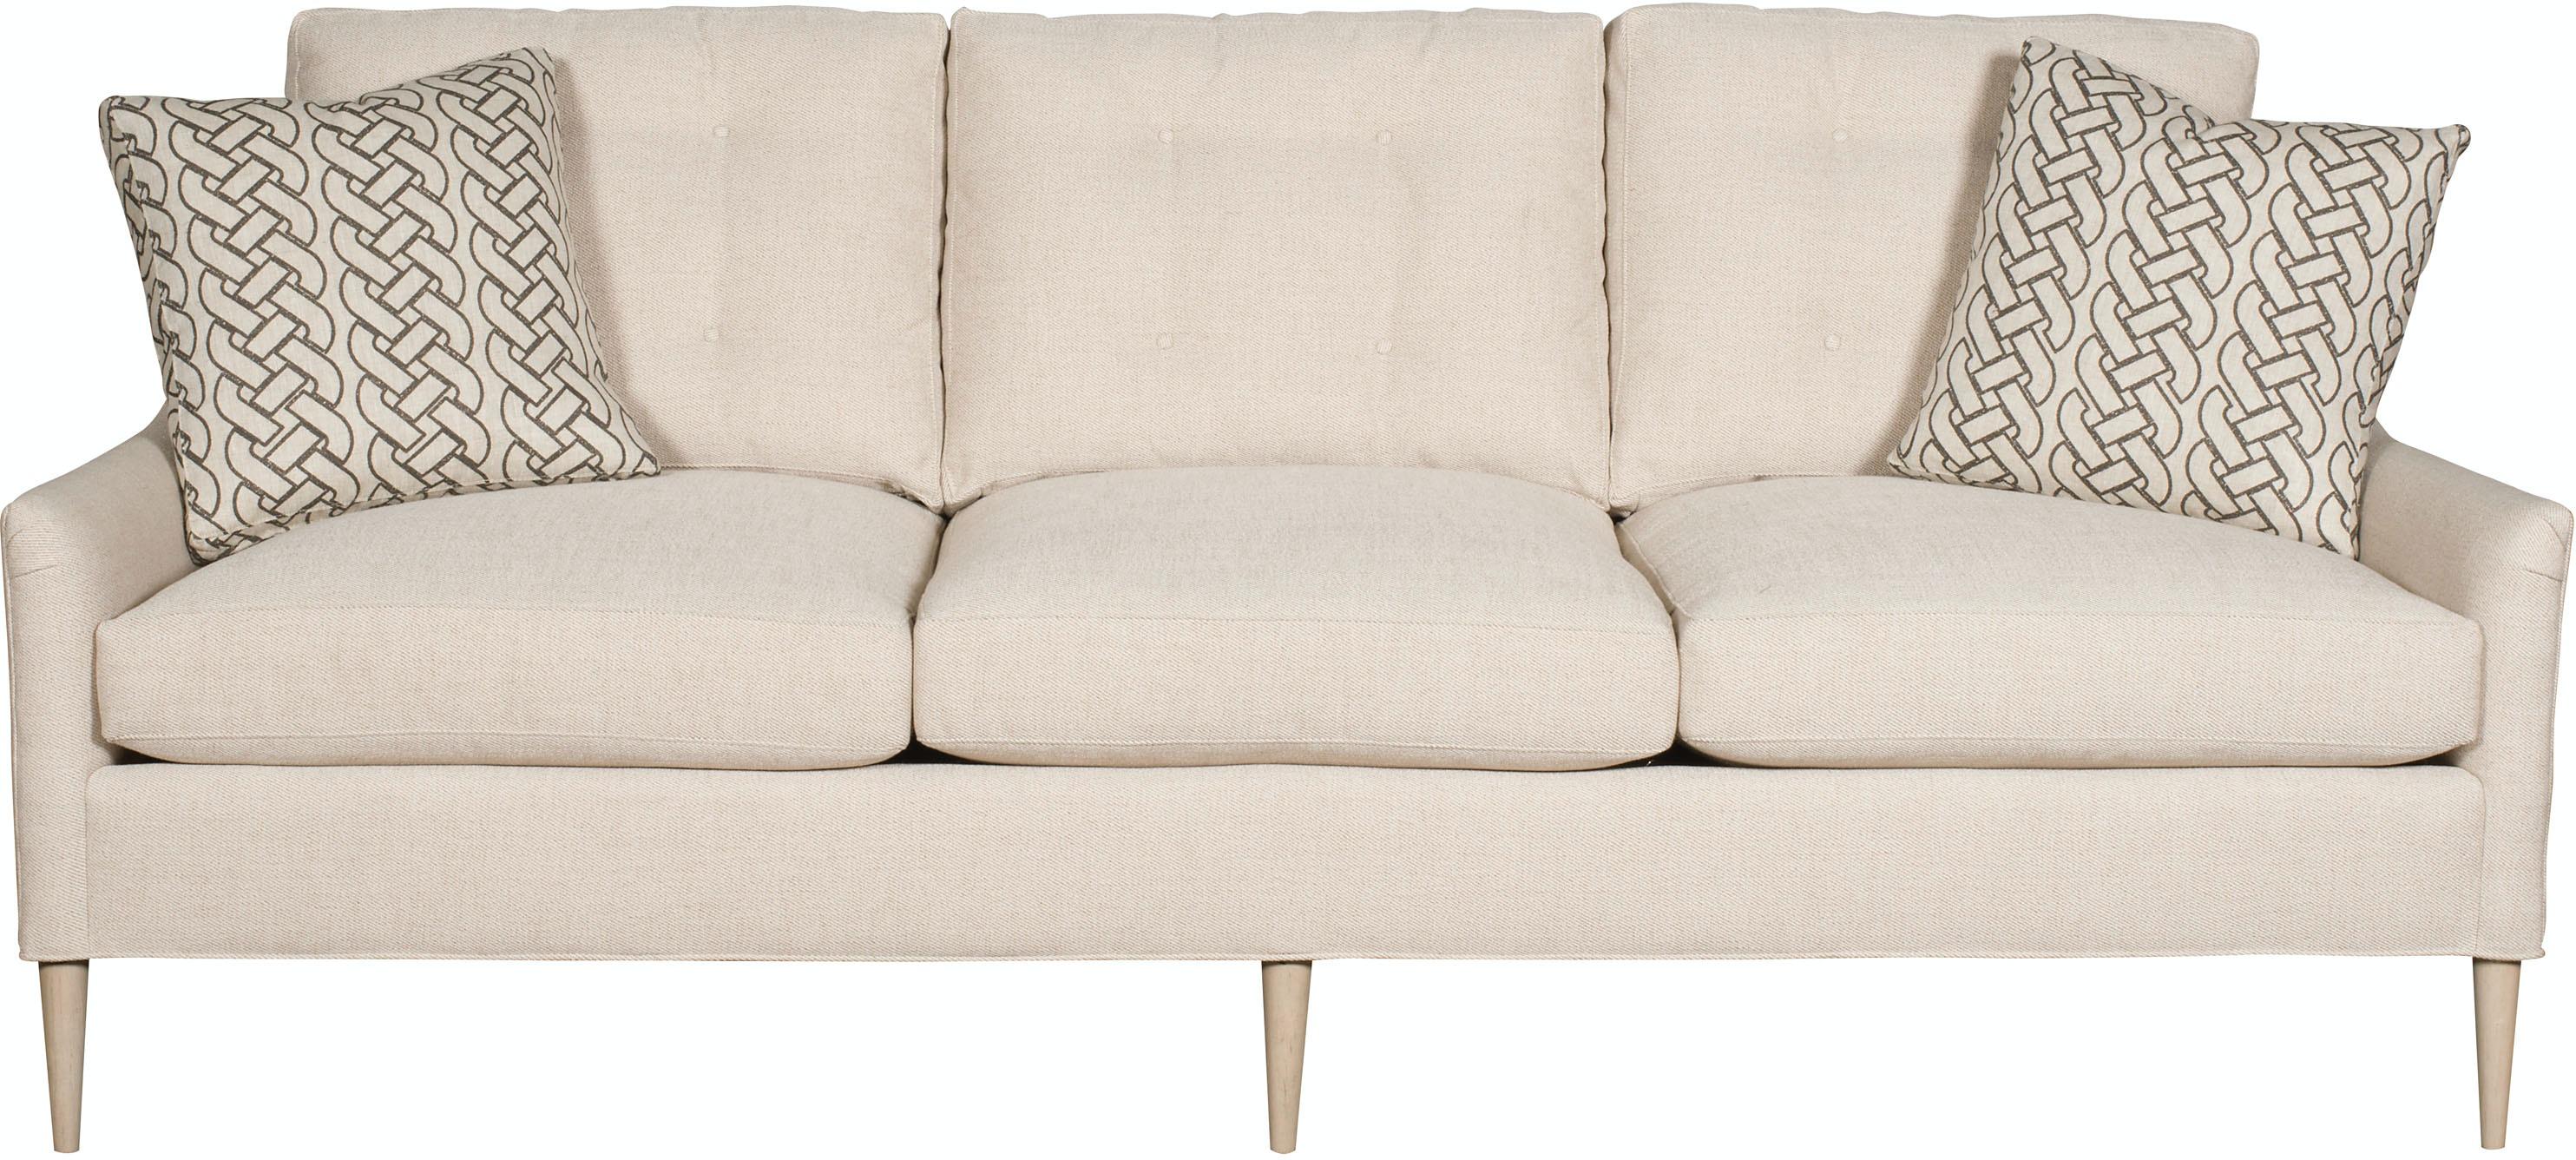 Vanguard Furniture Living Room Lydia Button Back Sofa V963 S